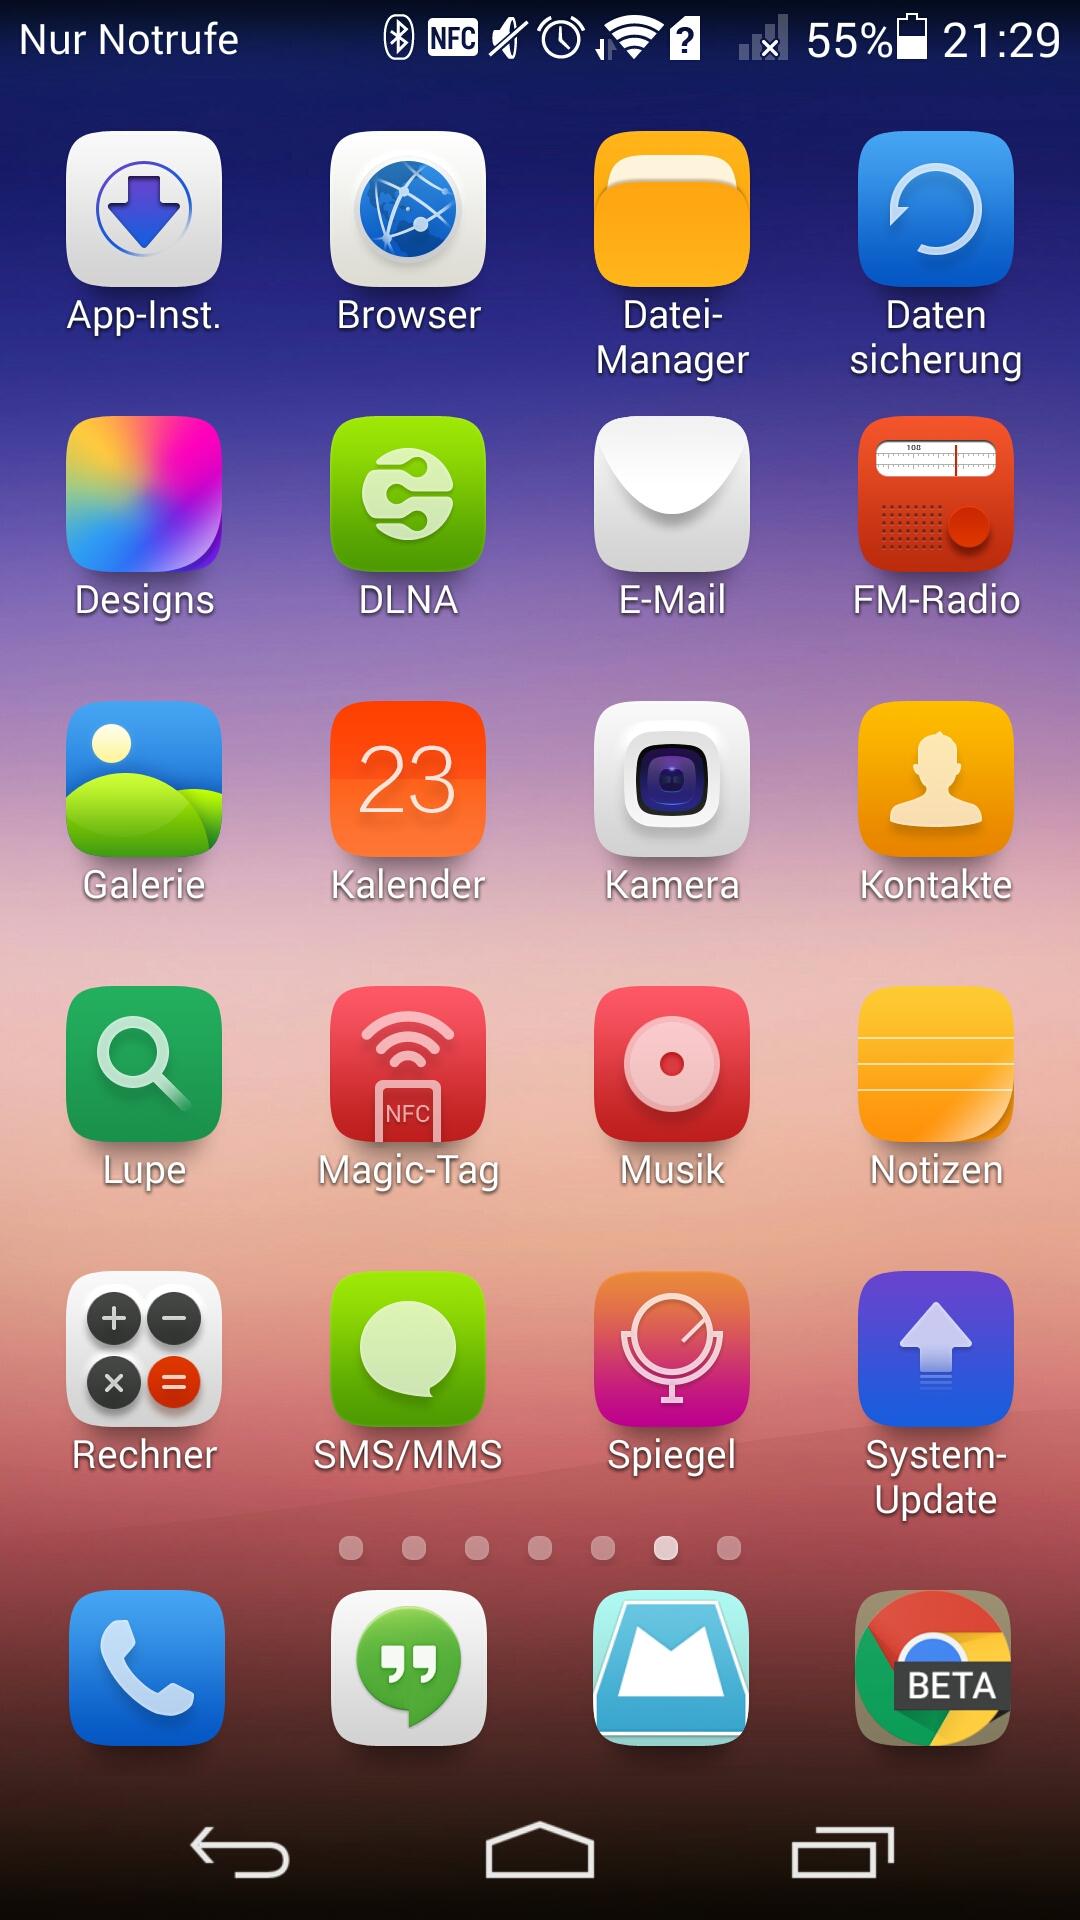 Emotion Ui Die Software Des Huawei Ascend P7